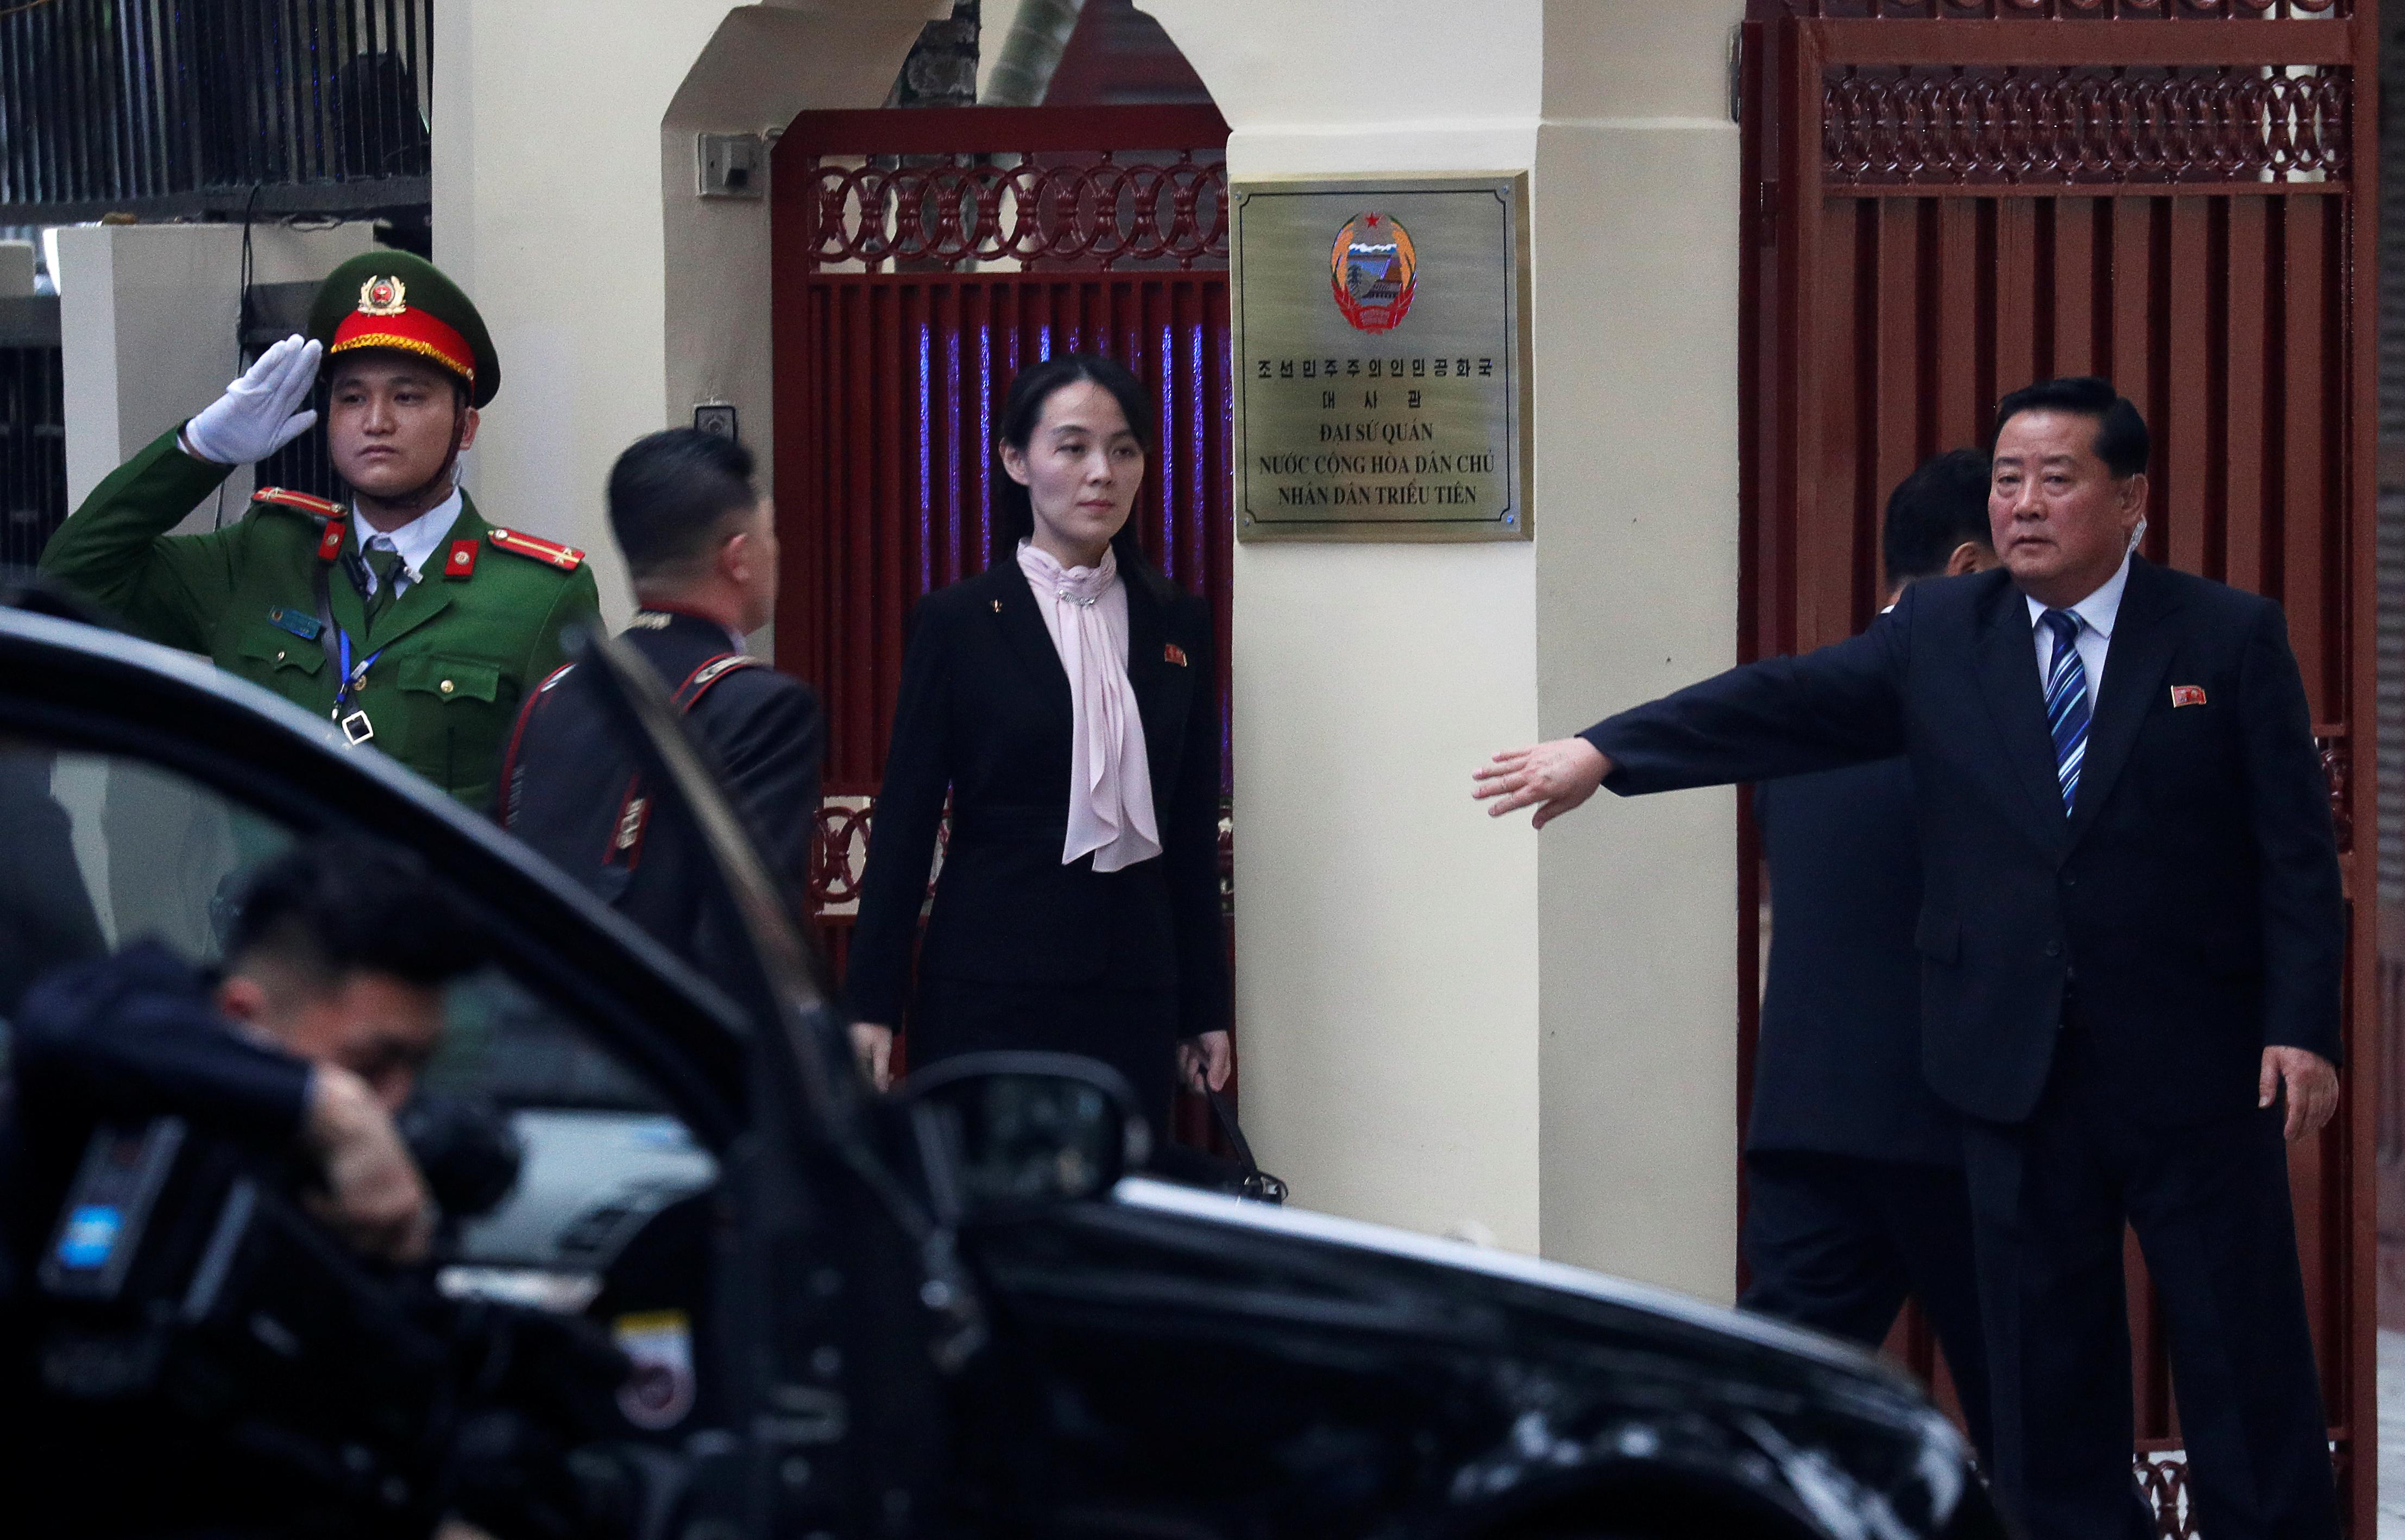 Kim Yo Jong, sister of North Korea's leader Kim Jong Un arrives at the North Korean embassy in Hanoi, Vietnam, February 26, 2019. REUTERS/Jorge Silva - RC1B0EE109B0